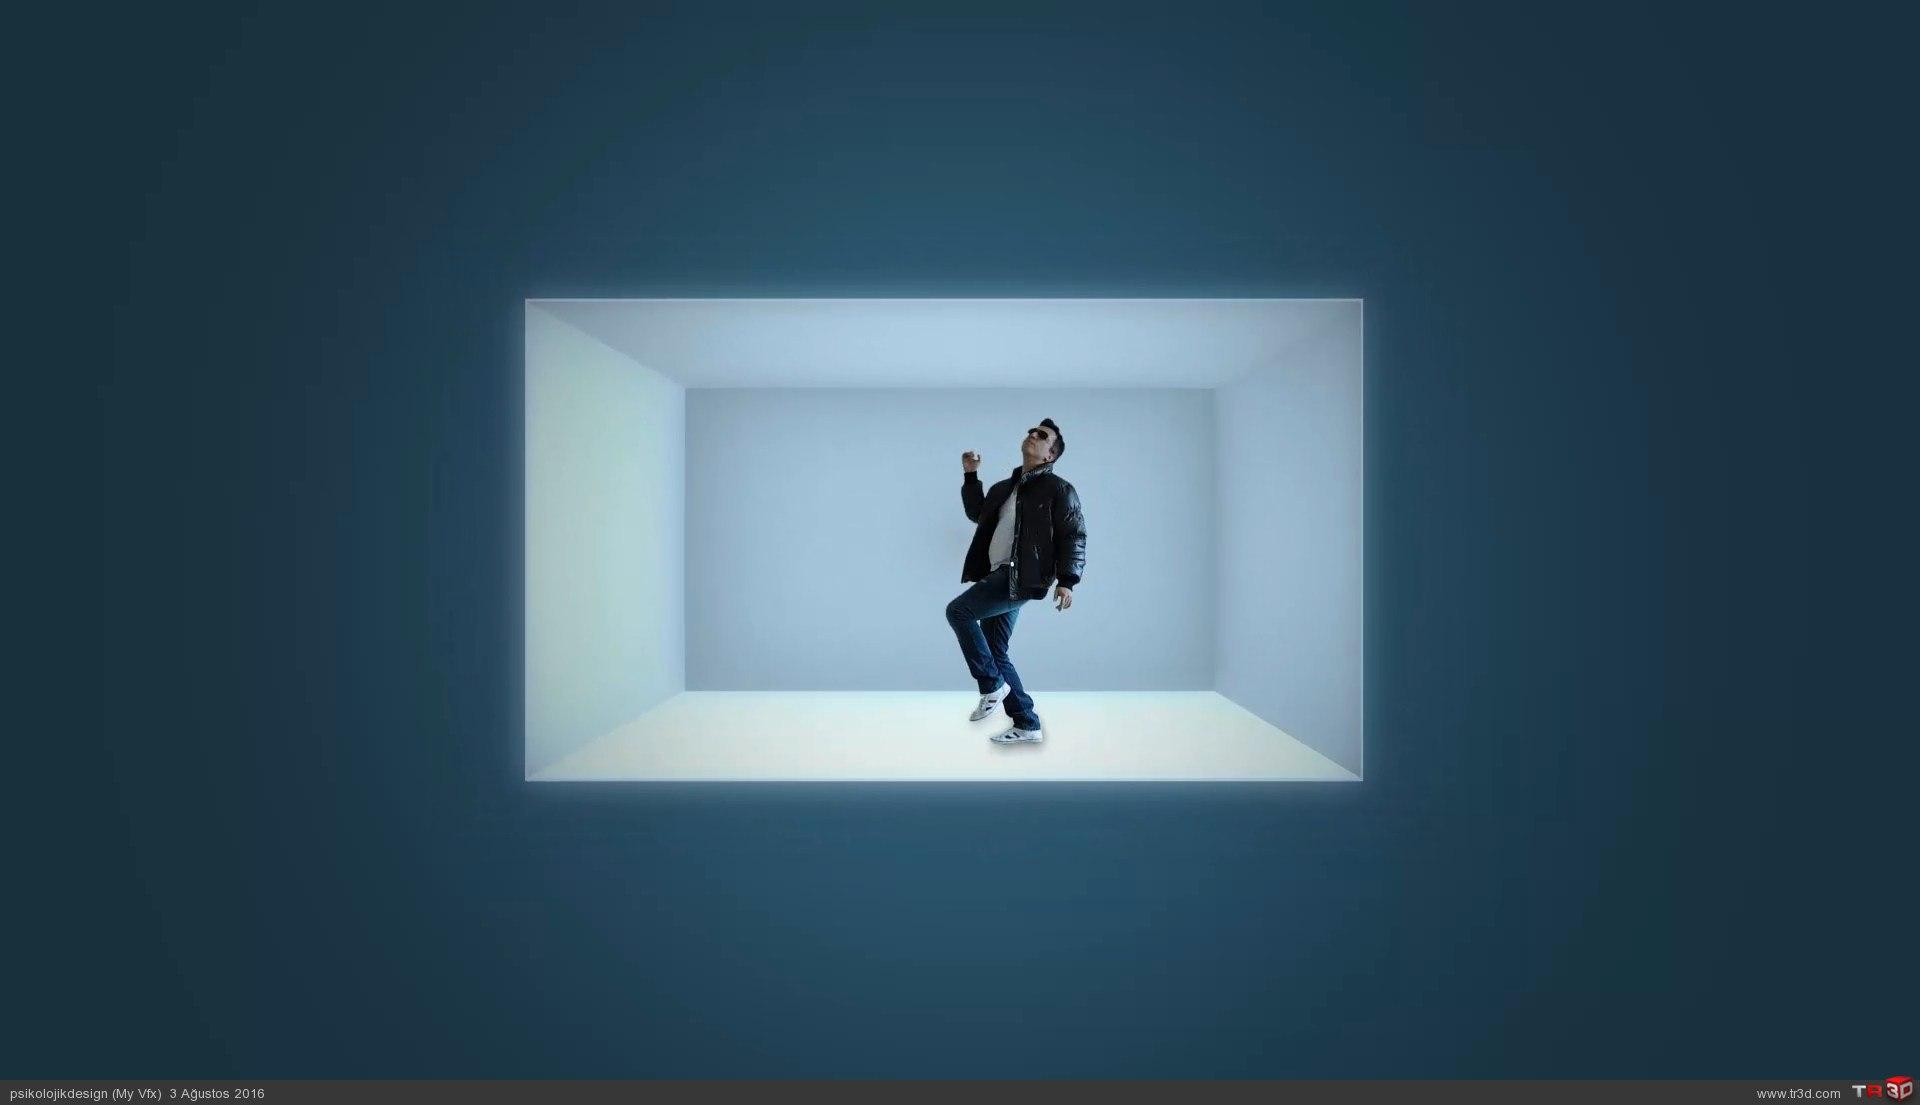 Drake Hotline Bling & Myvfx Karşılaştırma   After Effects - Cinema 4d Klip Yapım Dersi  2